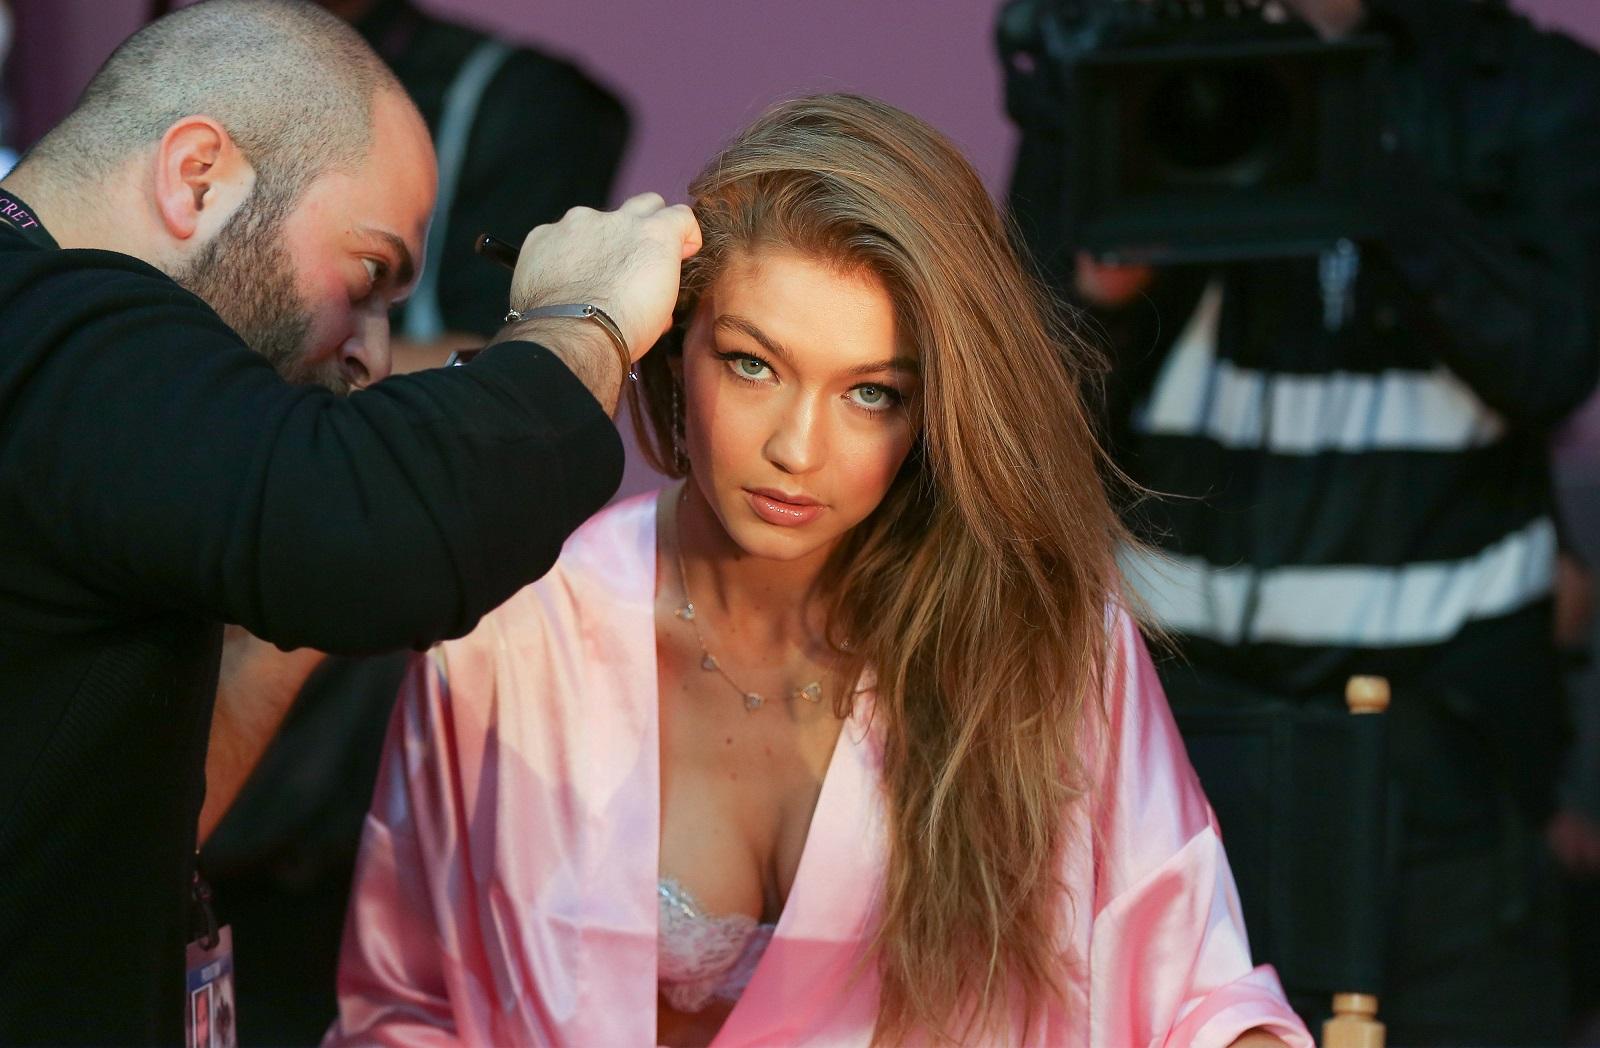 Gigi Hadid has her Hair & Makeup done prior the 2016 Victoria's Secret Fashion Show at the Grand Palais in Paris, FRANCE - 30/11/2016.//PLV_VU_111296/Credit:LaurentVu/SIPA/1611301453